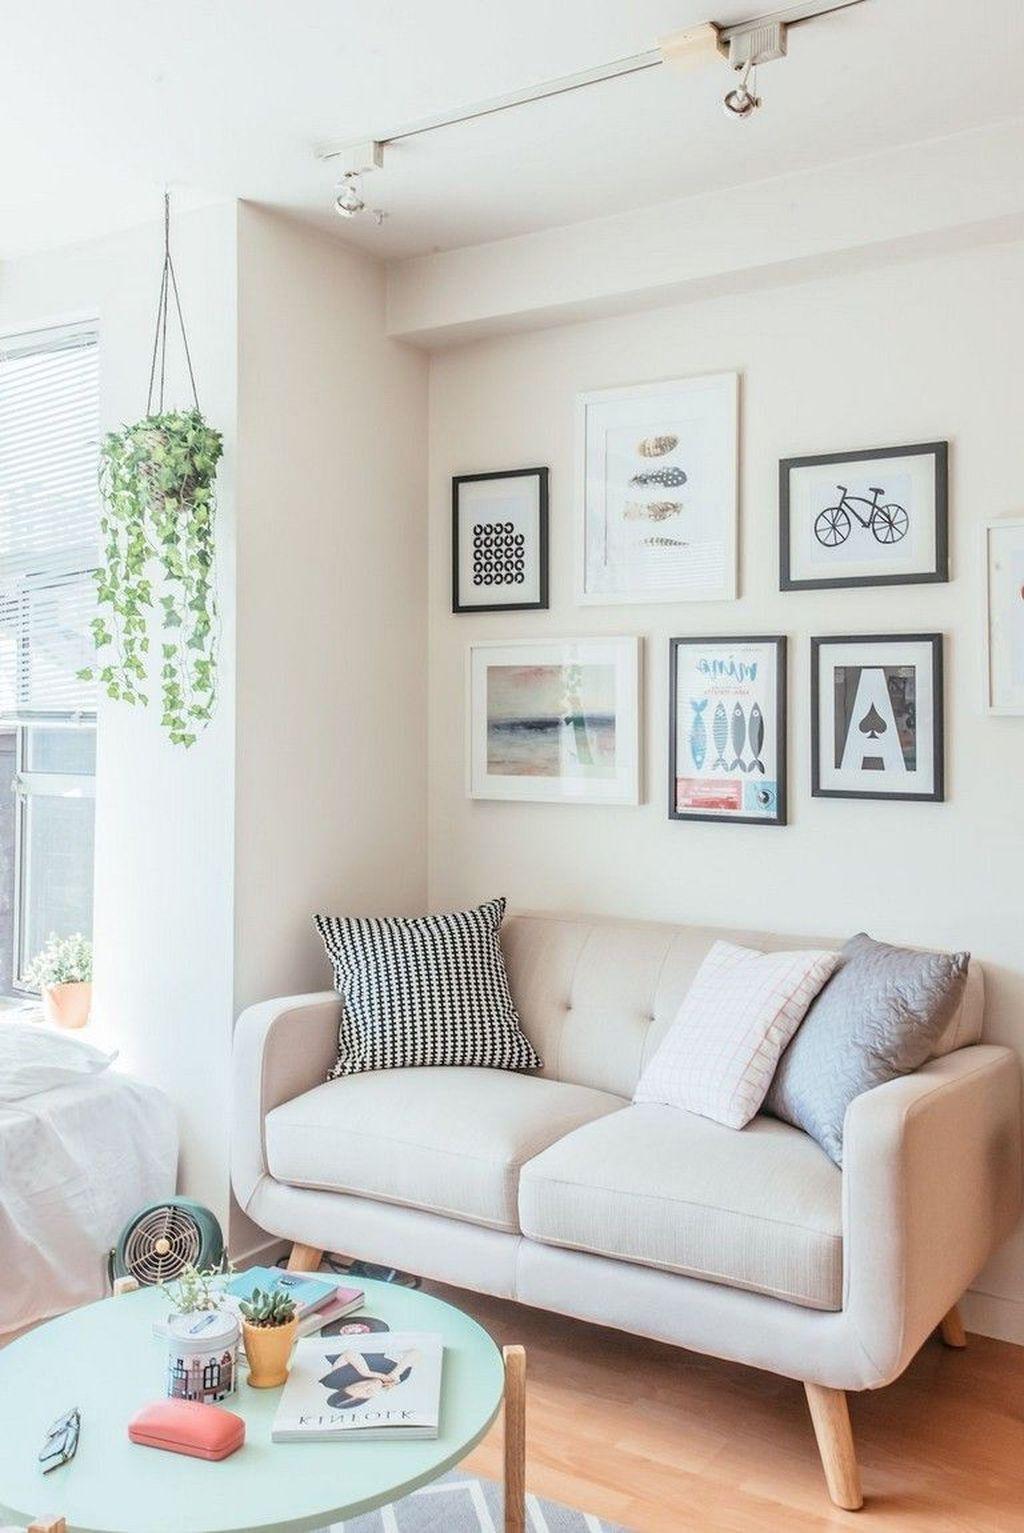 37 Minimalist Apartment Decorating Ideas On A Budget ... on Awesome Apartment Budget Apartment Living Room Ideas  id=86928